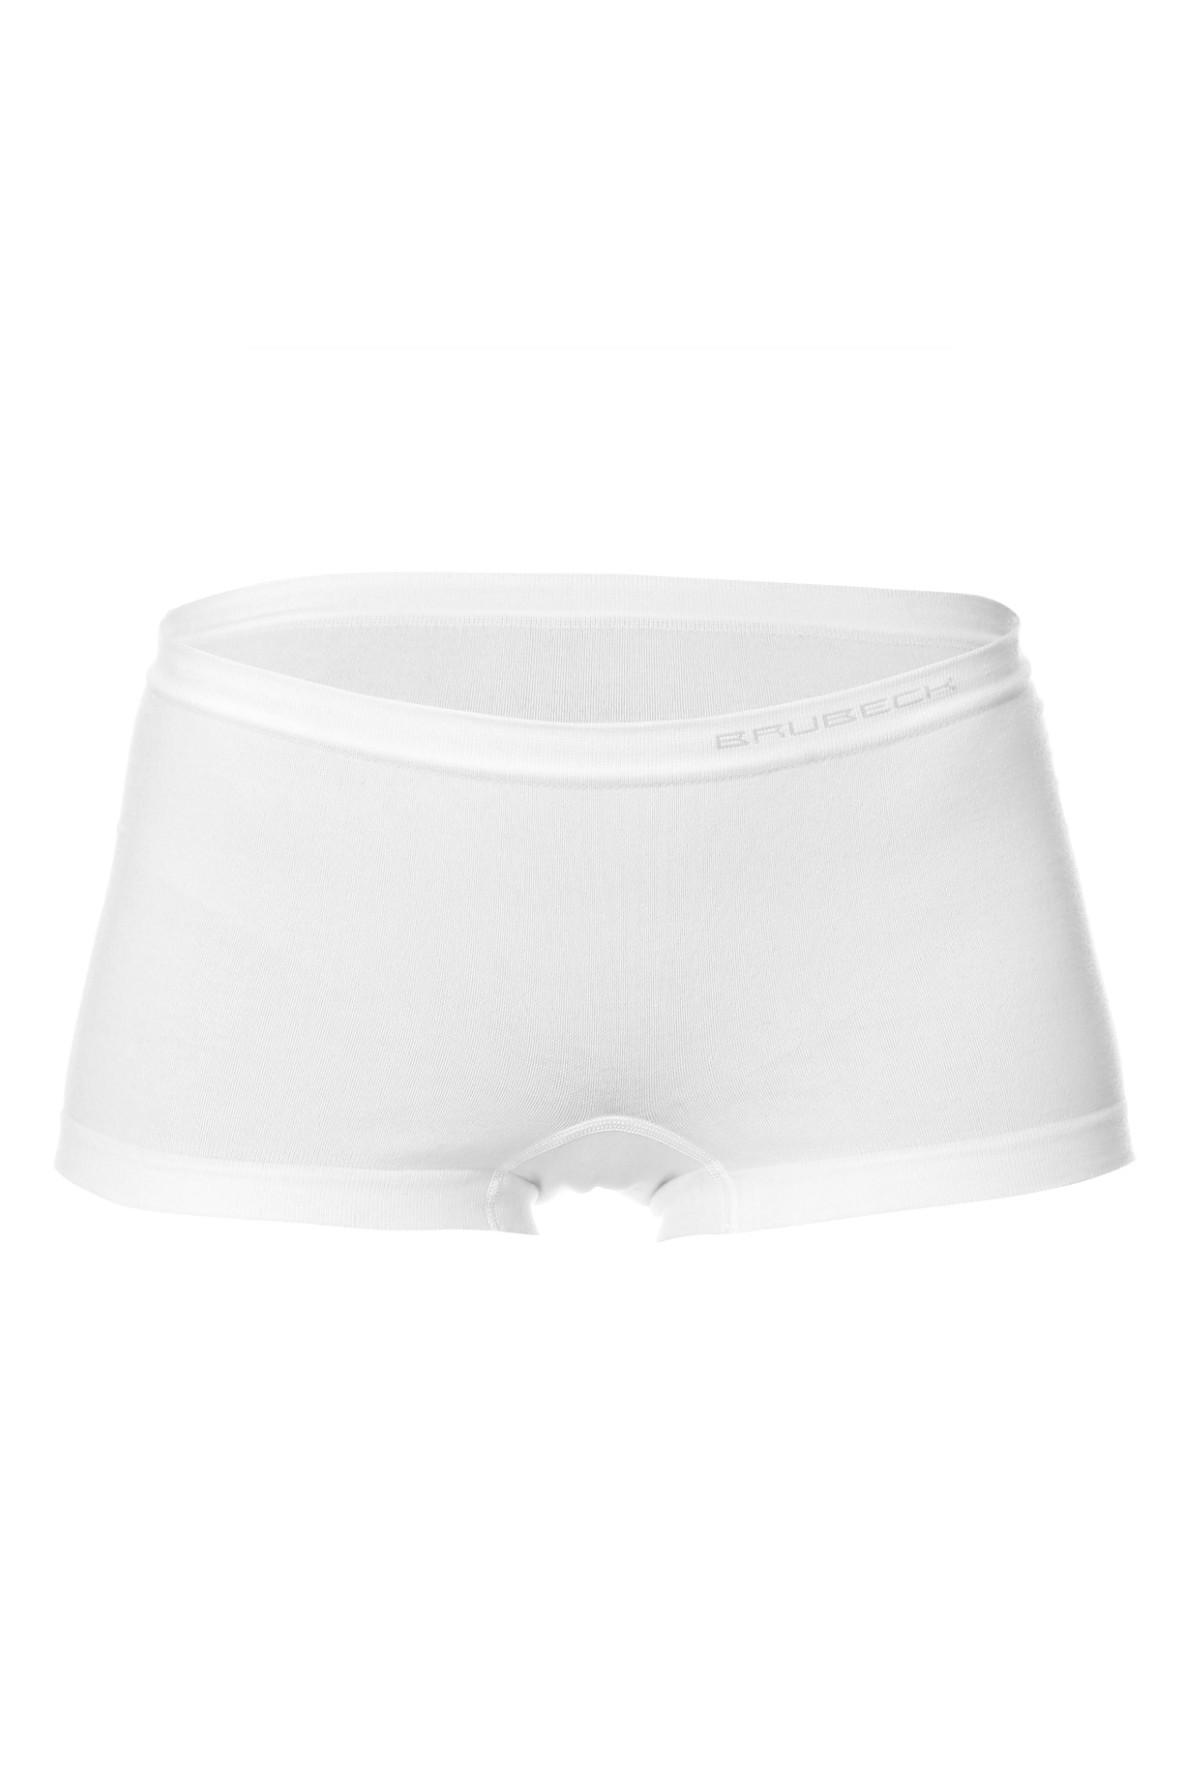 Bokserki damskie COMFORT COTTON kolor biały